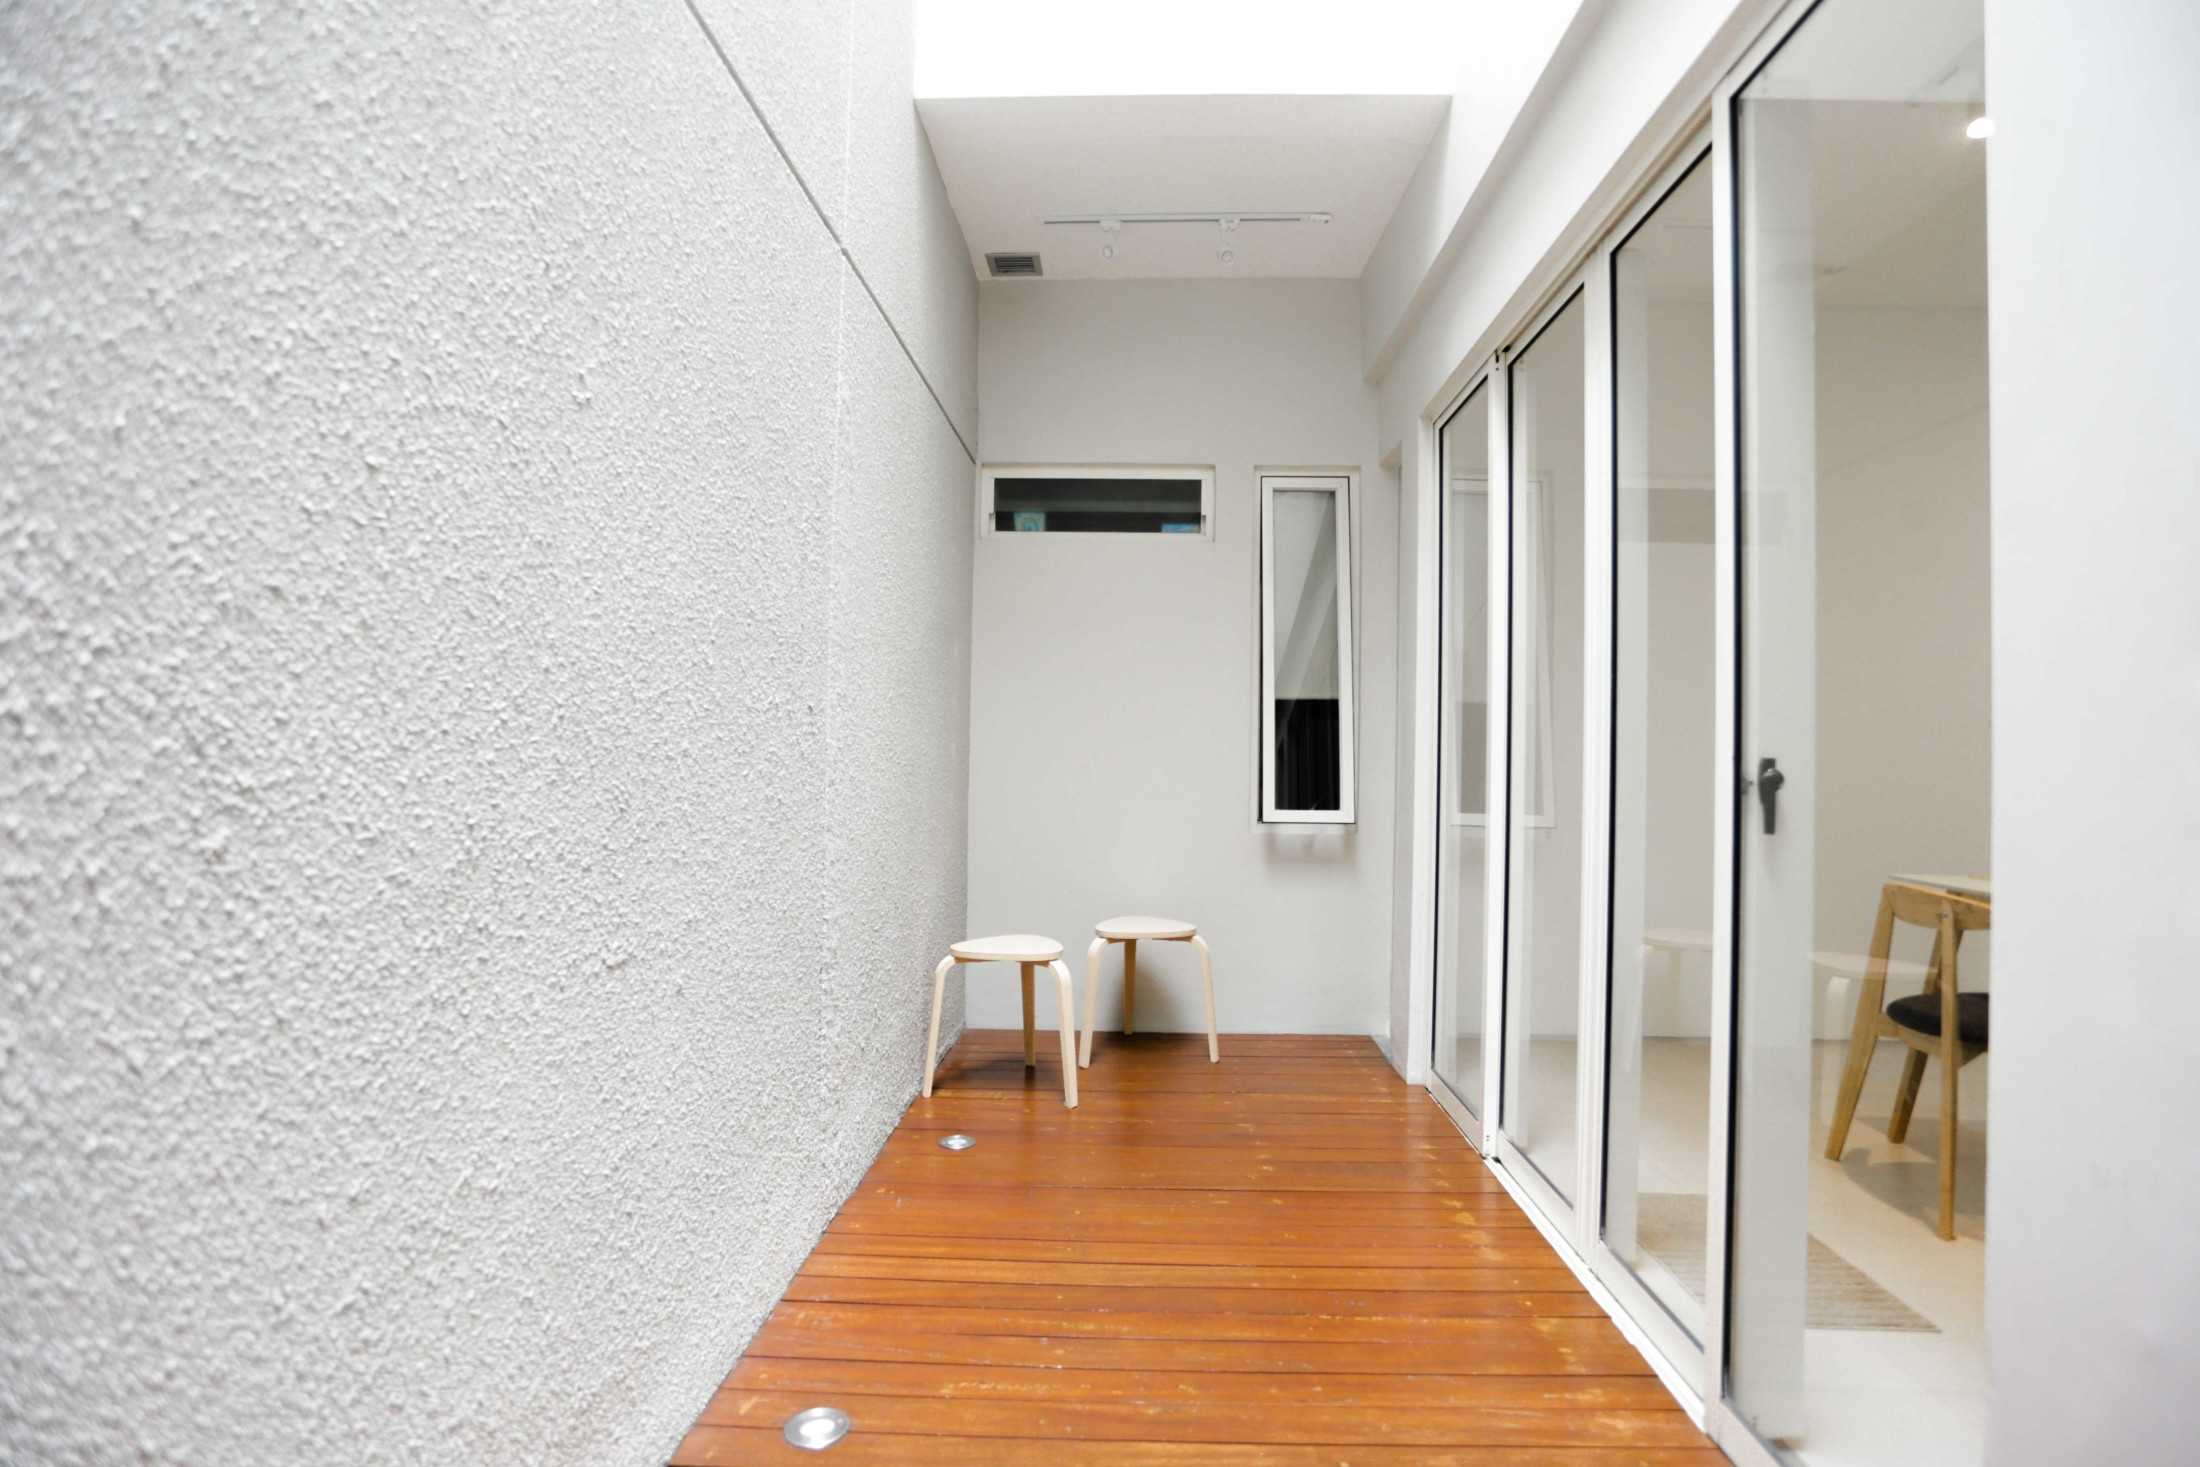 Samitrayasa Design Sh Residence Jakarta Selatan, Kota Jakarta Selatan, Daerah Khusus Ibukota Jakarta, Indonesia Jakarta Selatan, Kota Jakarta Selatan, Daerah Khusus Ibukota Jakarta, Indonesia Samitrayasa-Design-Sh-Residence  108326